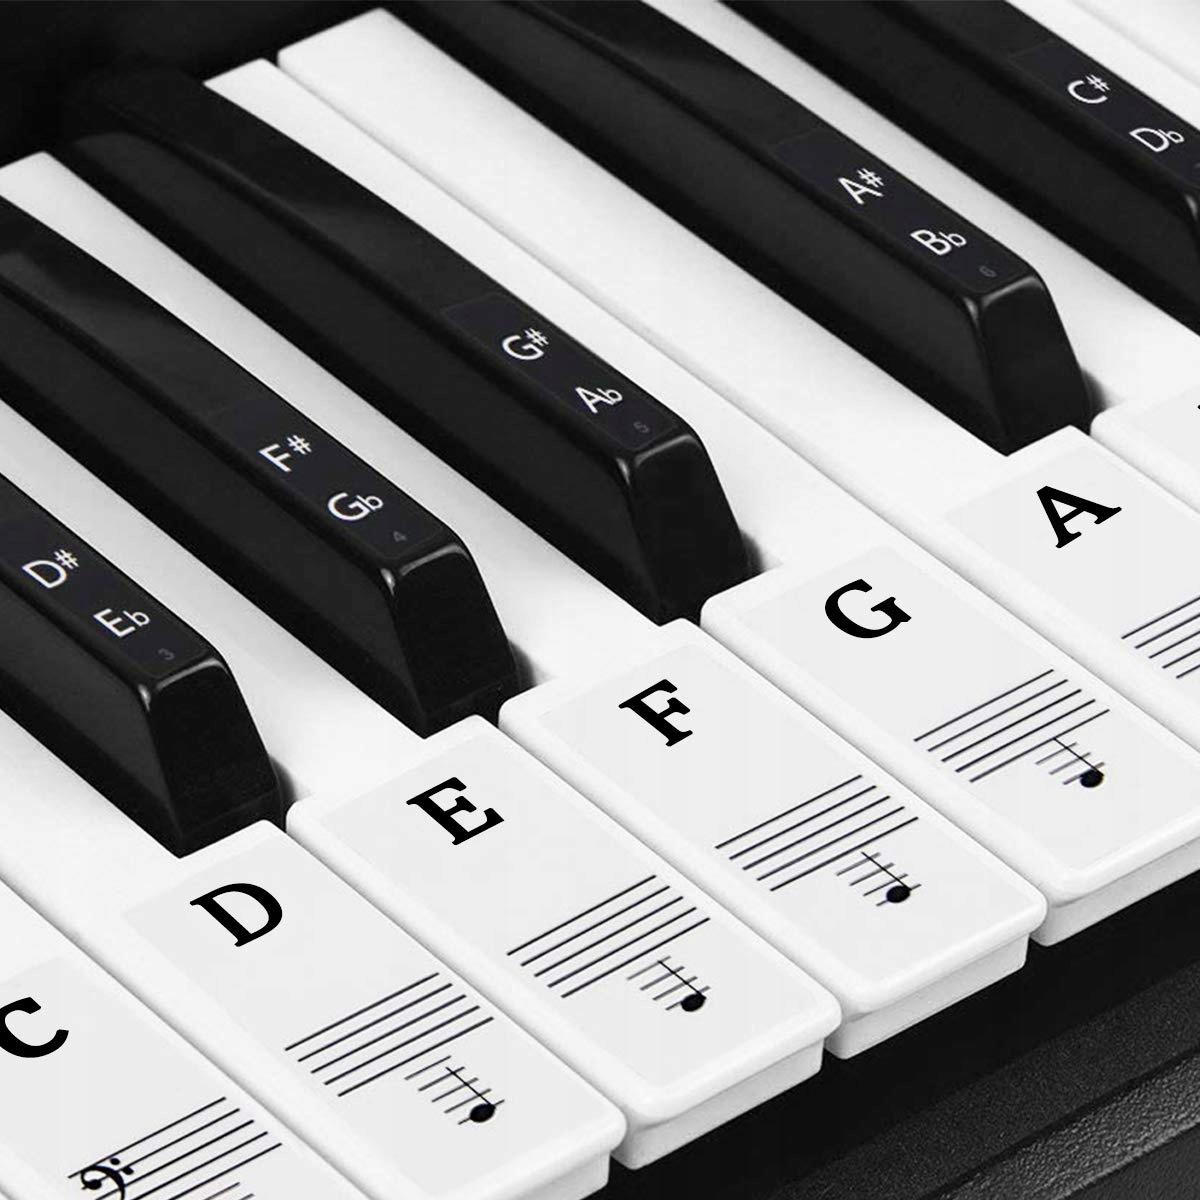 Картинки пианино клавиши с обозначением